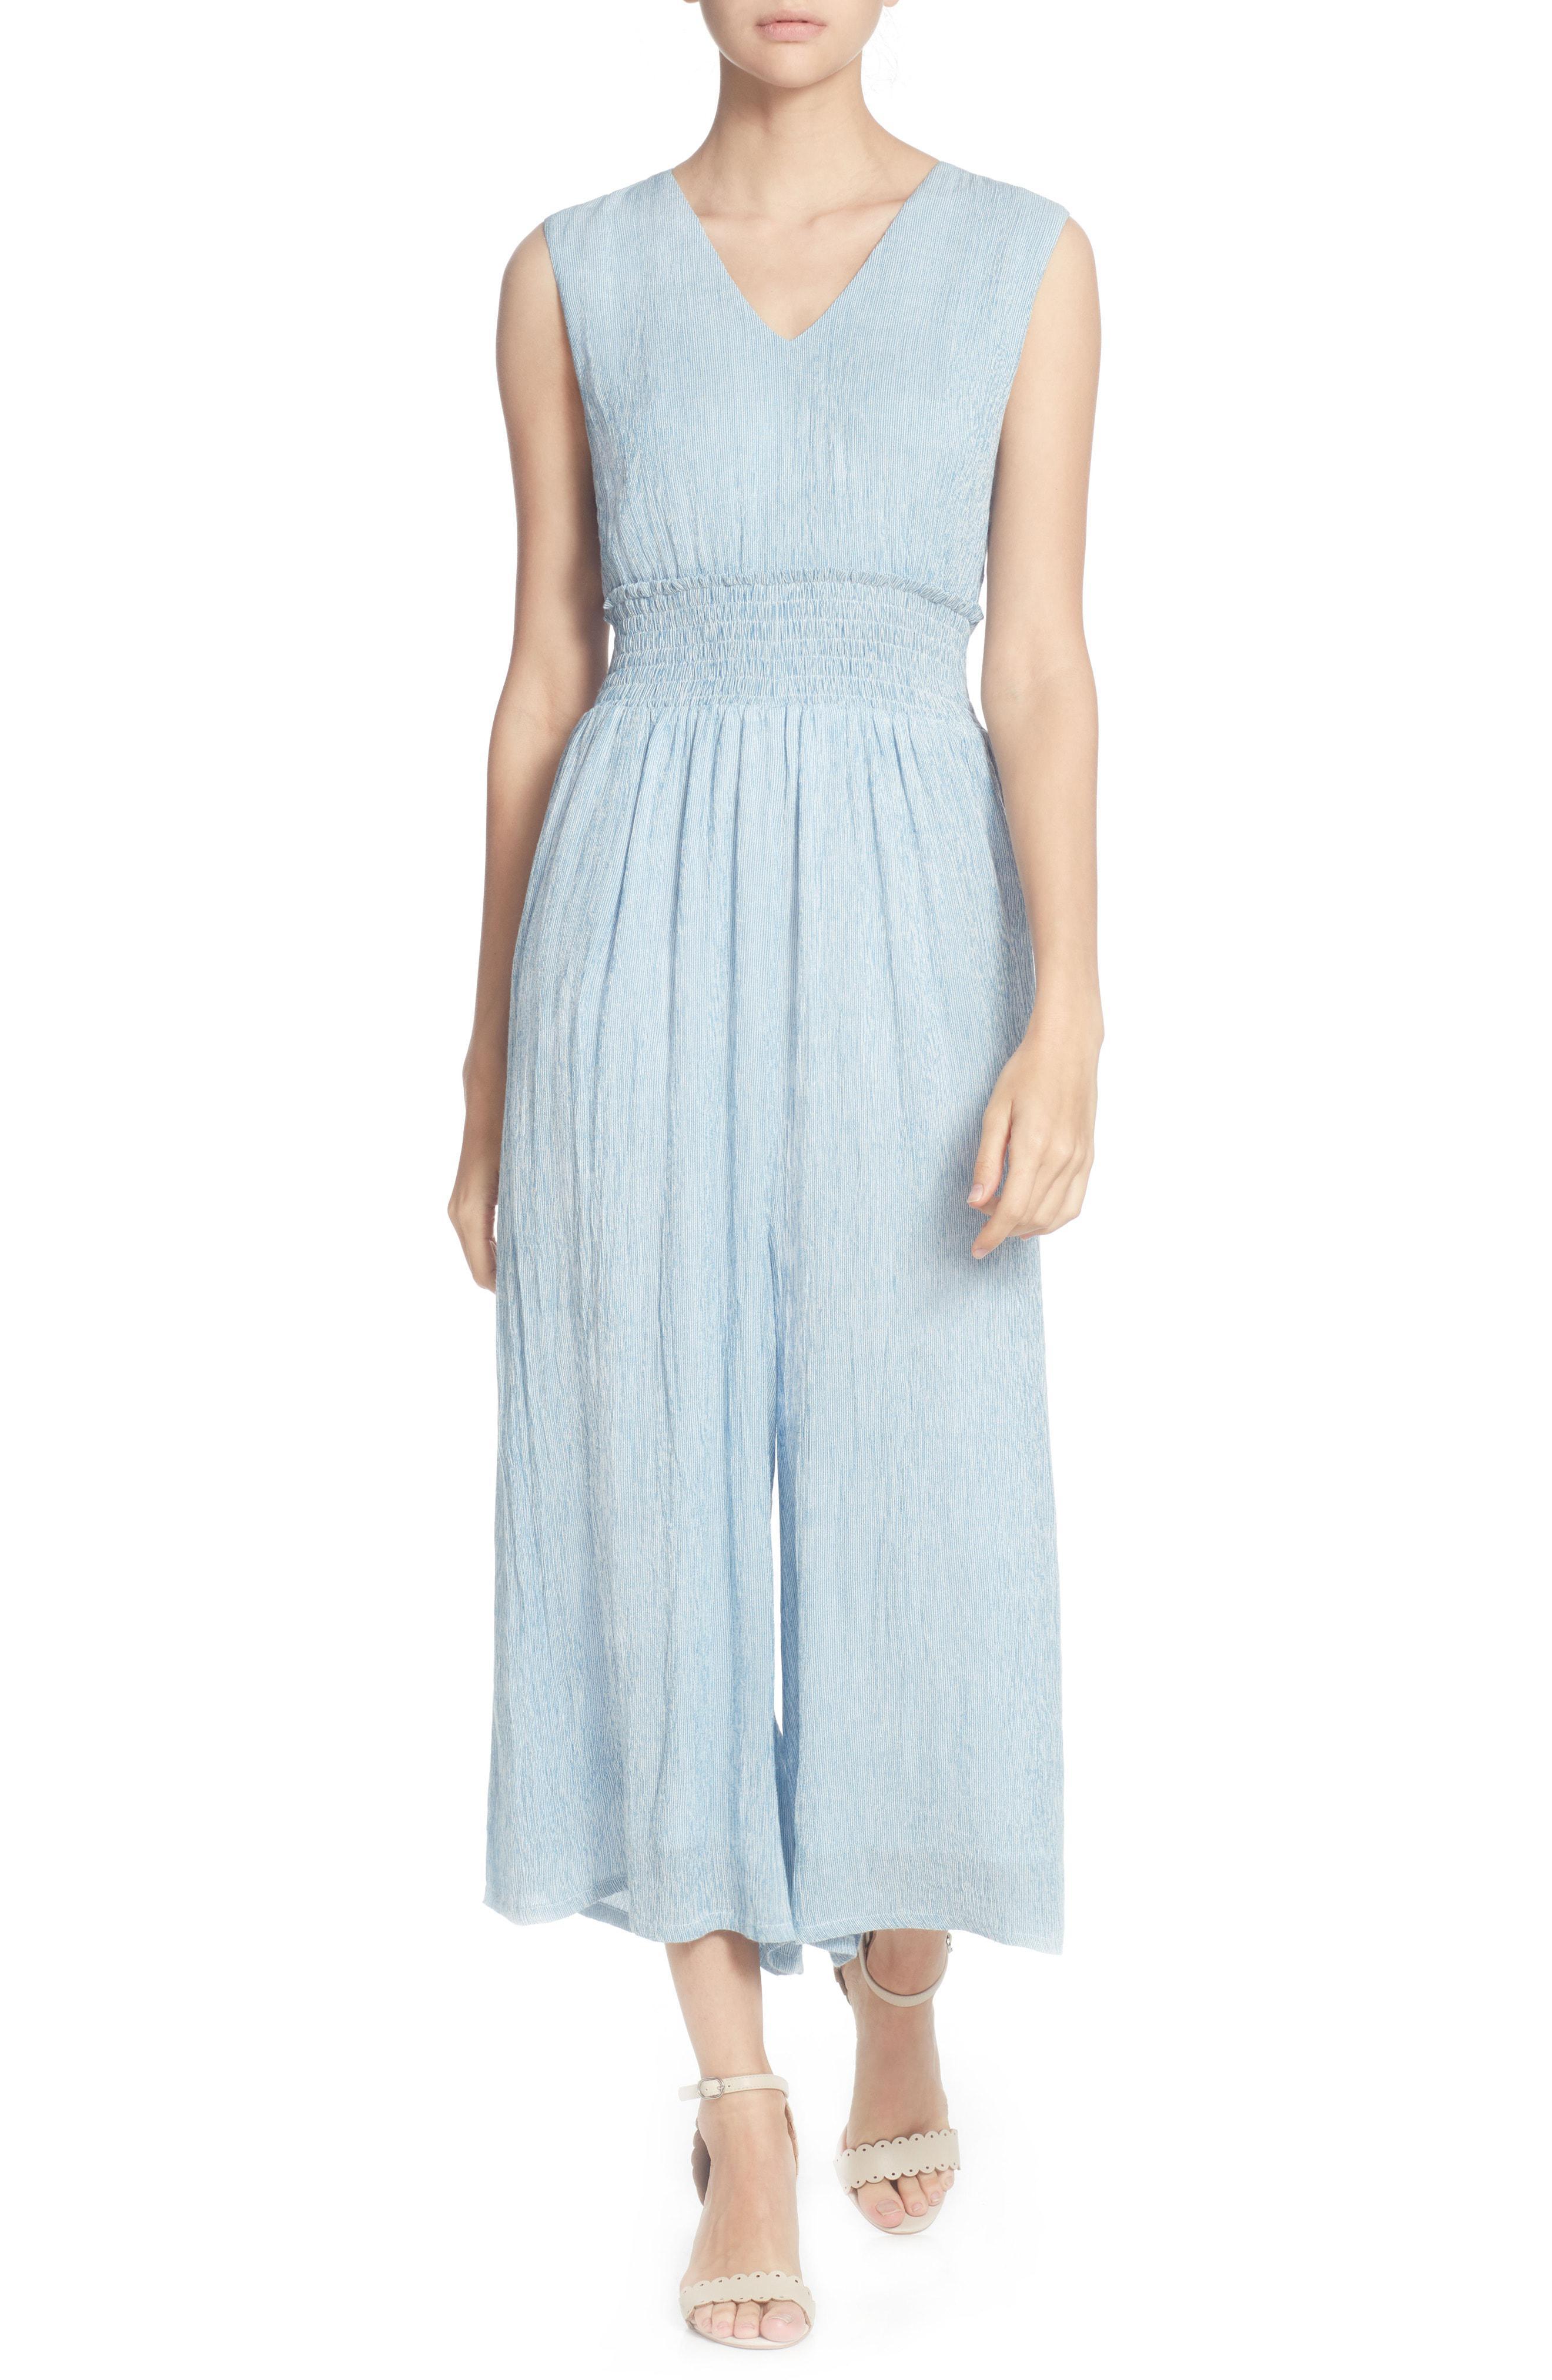 8eaffef3e49 Lyst - Catherine Malandrino Braden Smocked Crop Jumpsuit in Blue